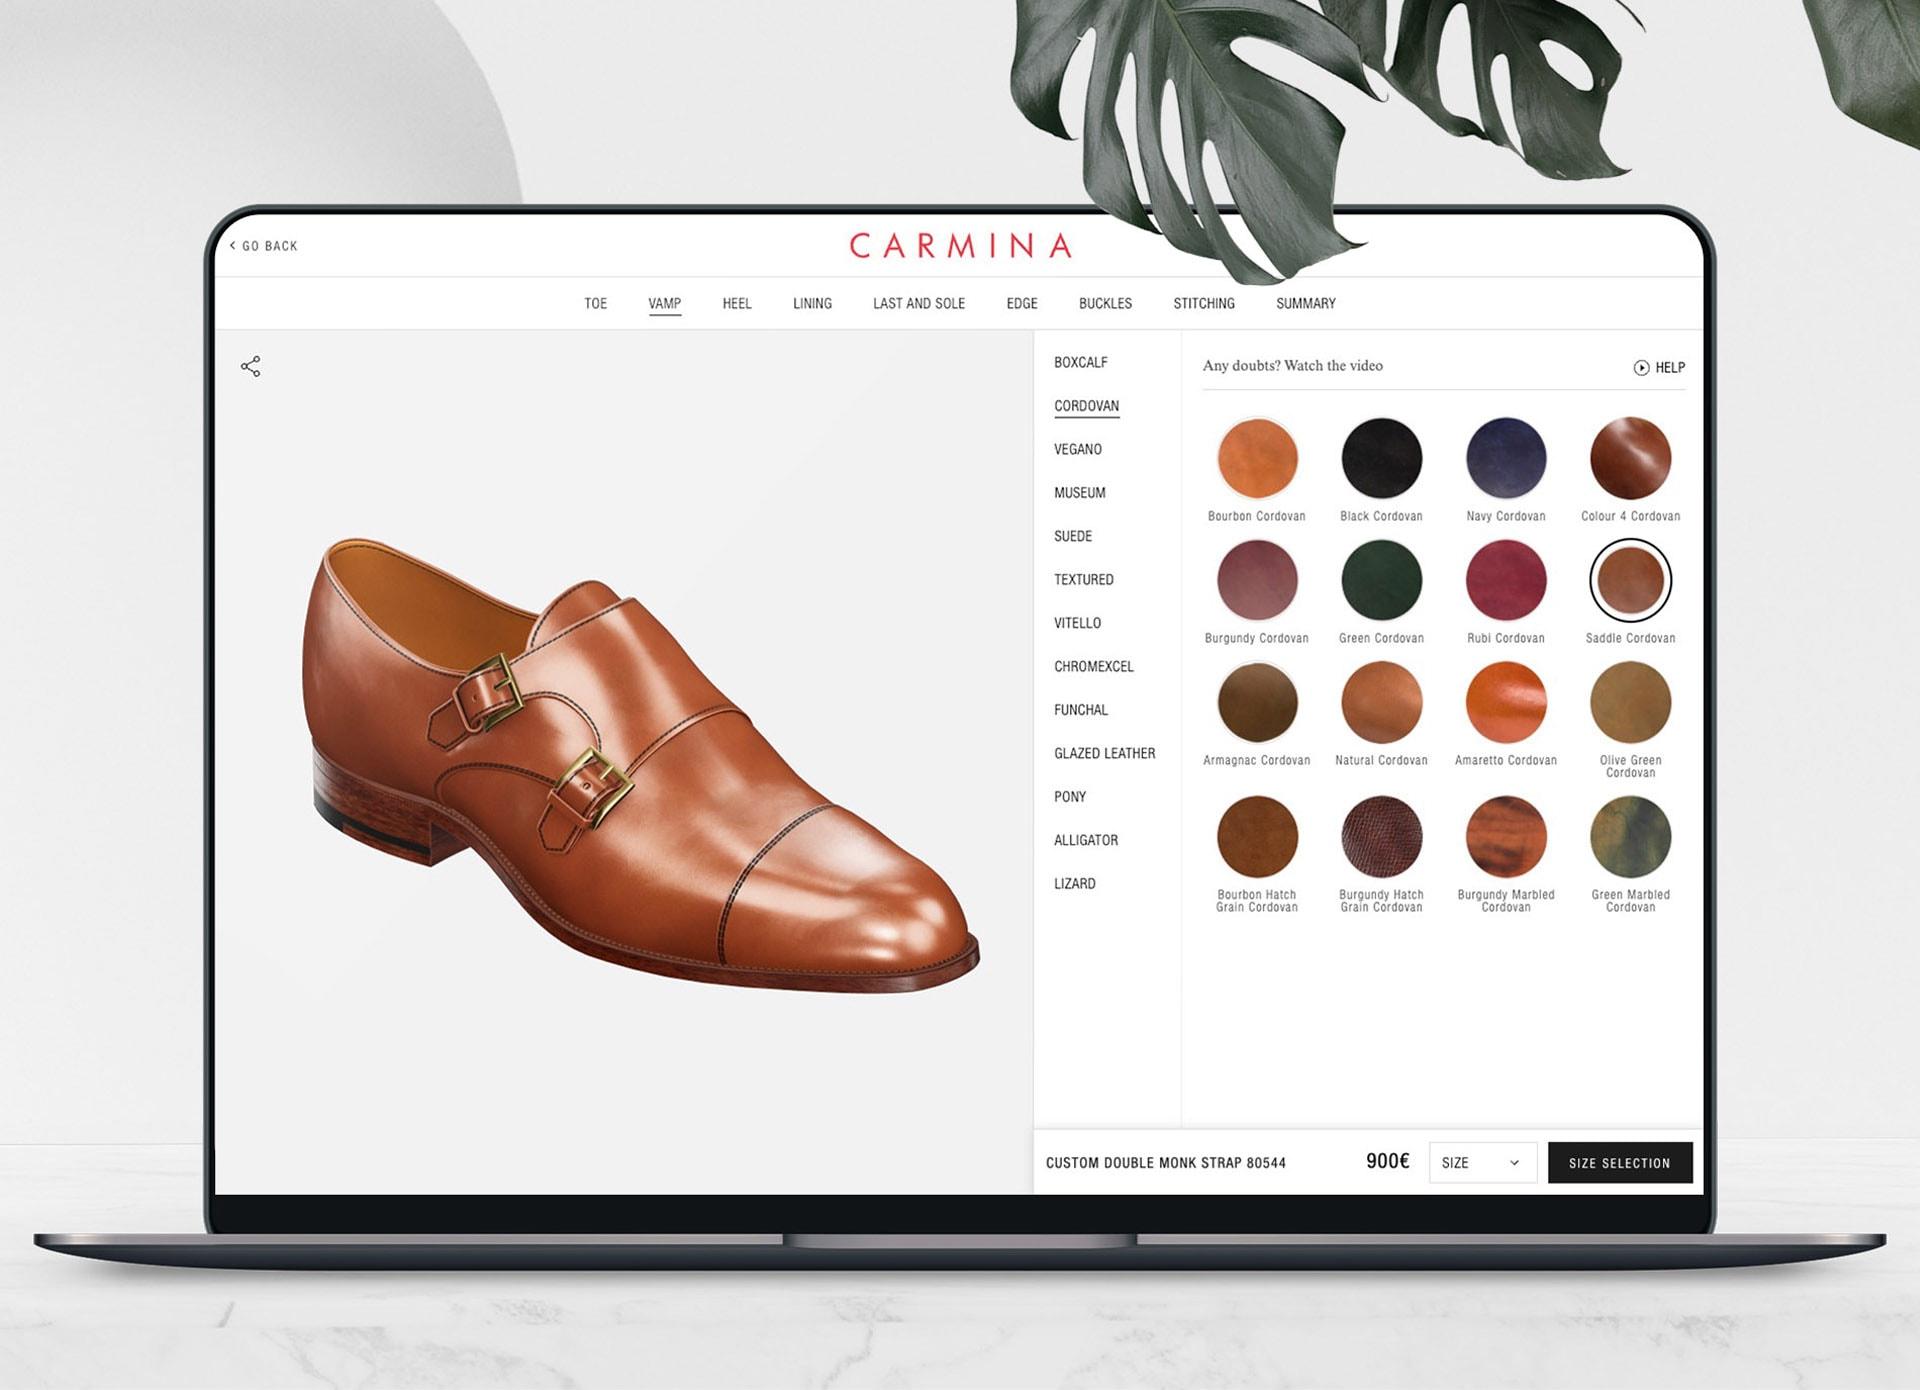 carmina_shoemaker_customizer_cover